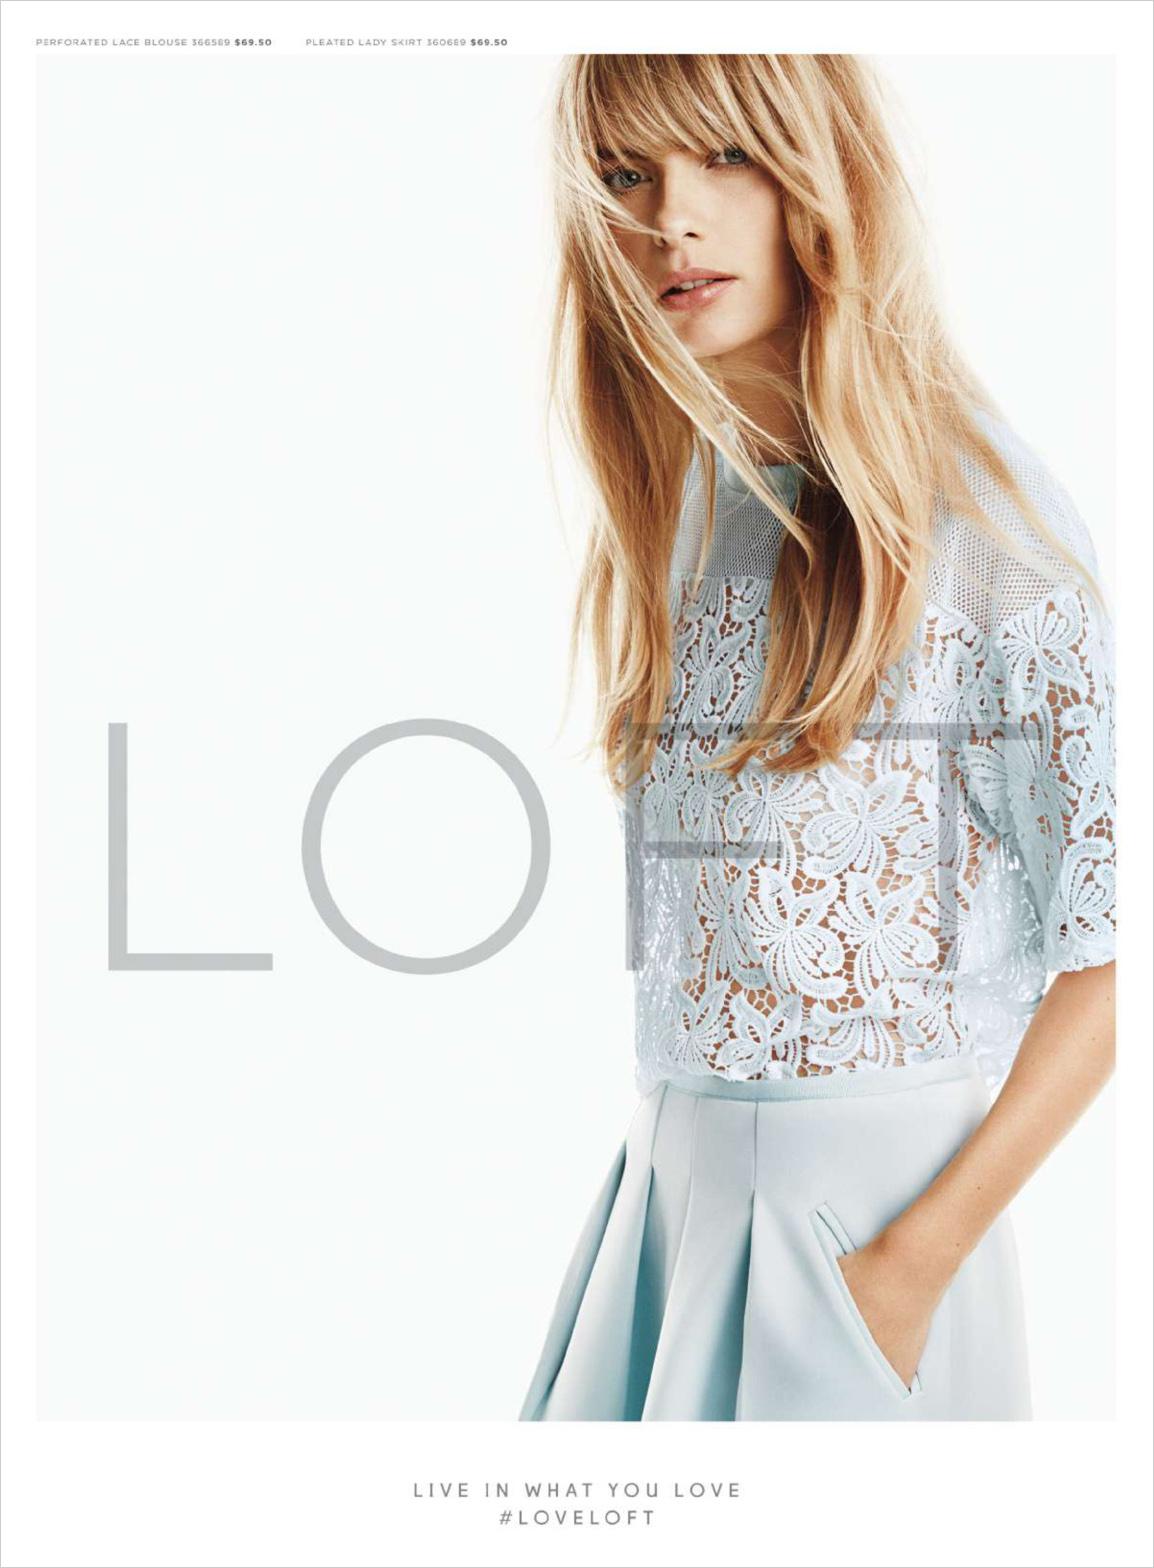 loft-spring-ad campaign-2015-the-impression-02